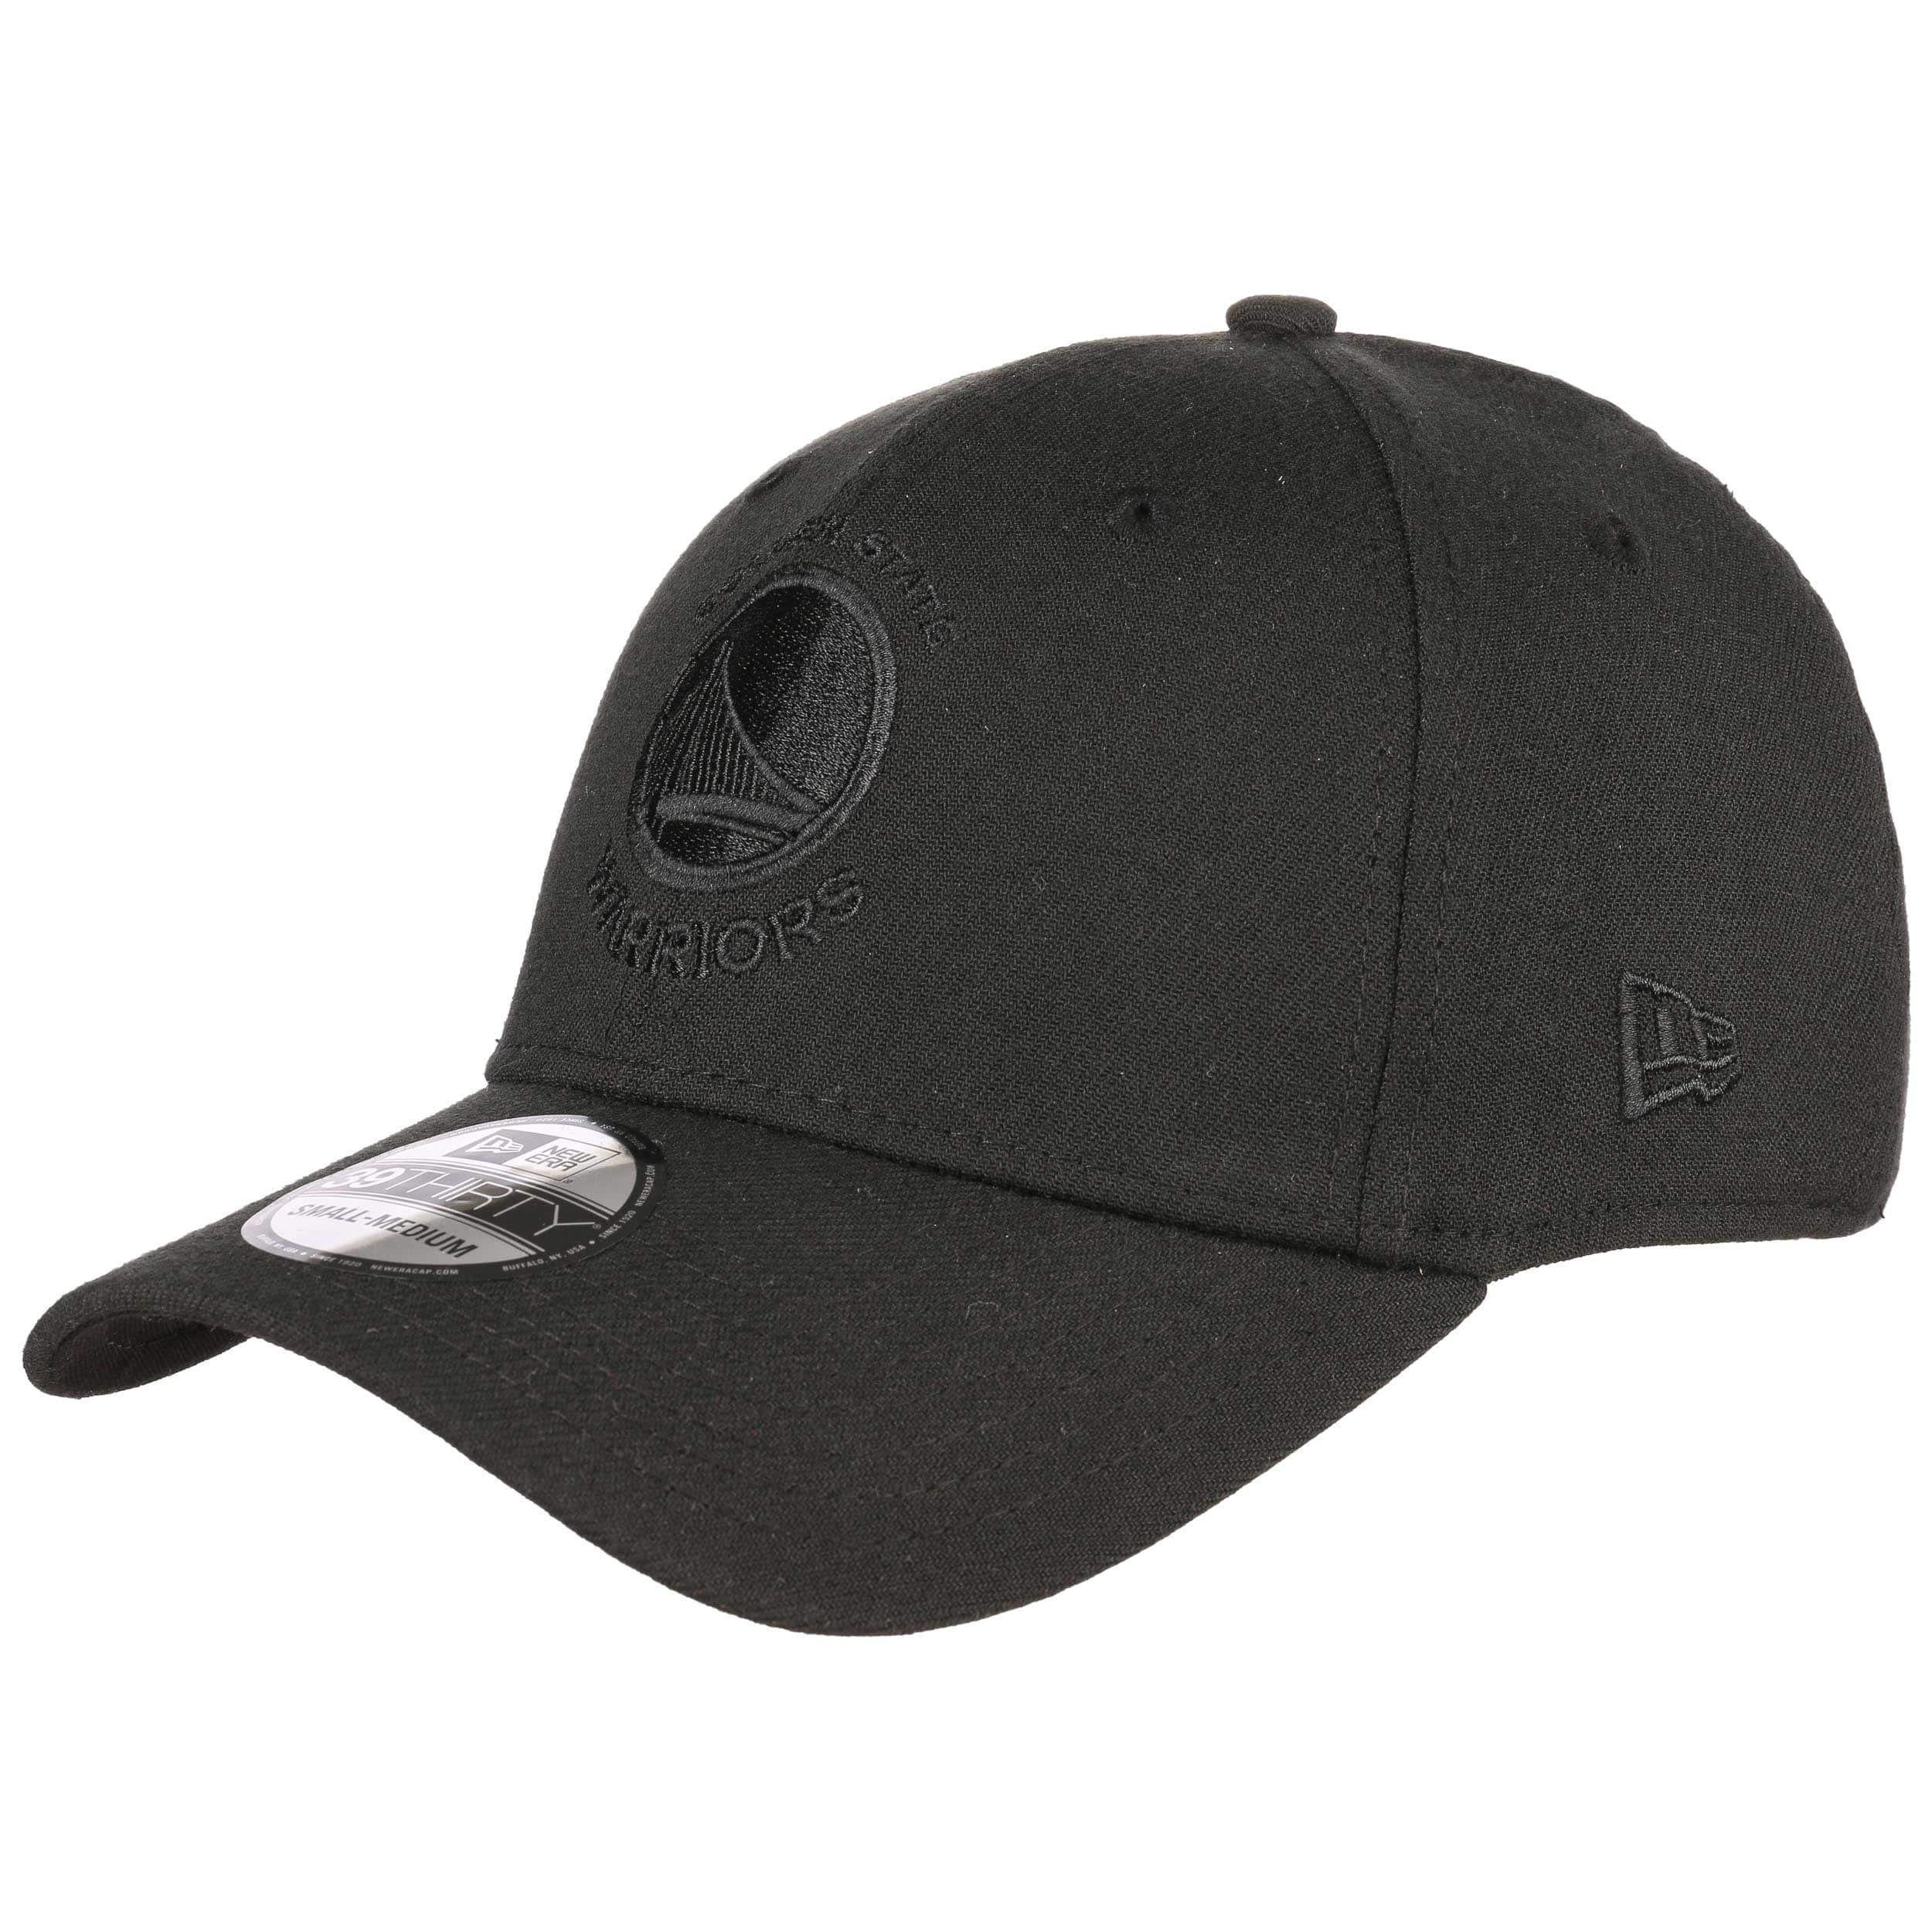 39thirty warriors bob cap by new era eur 24 95 hats caps beanies shop online. Black Bedroom Furniture Sets. Home Design Ideas